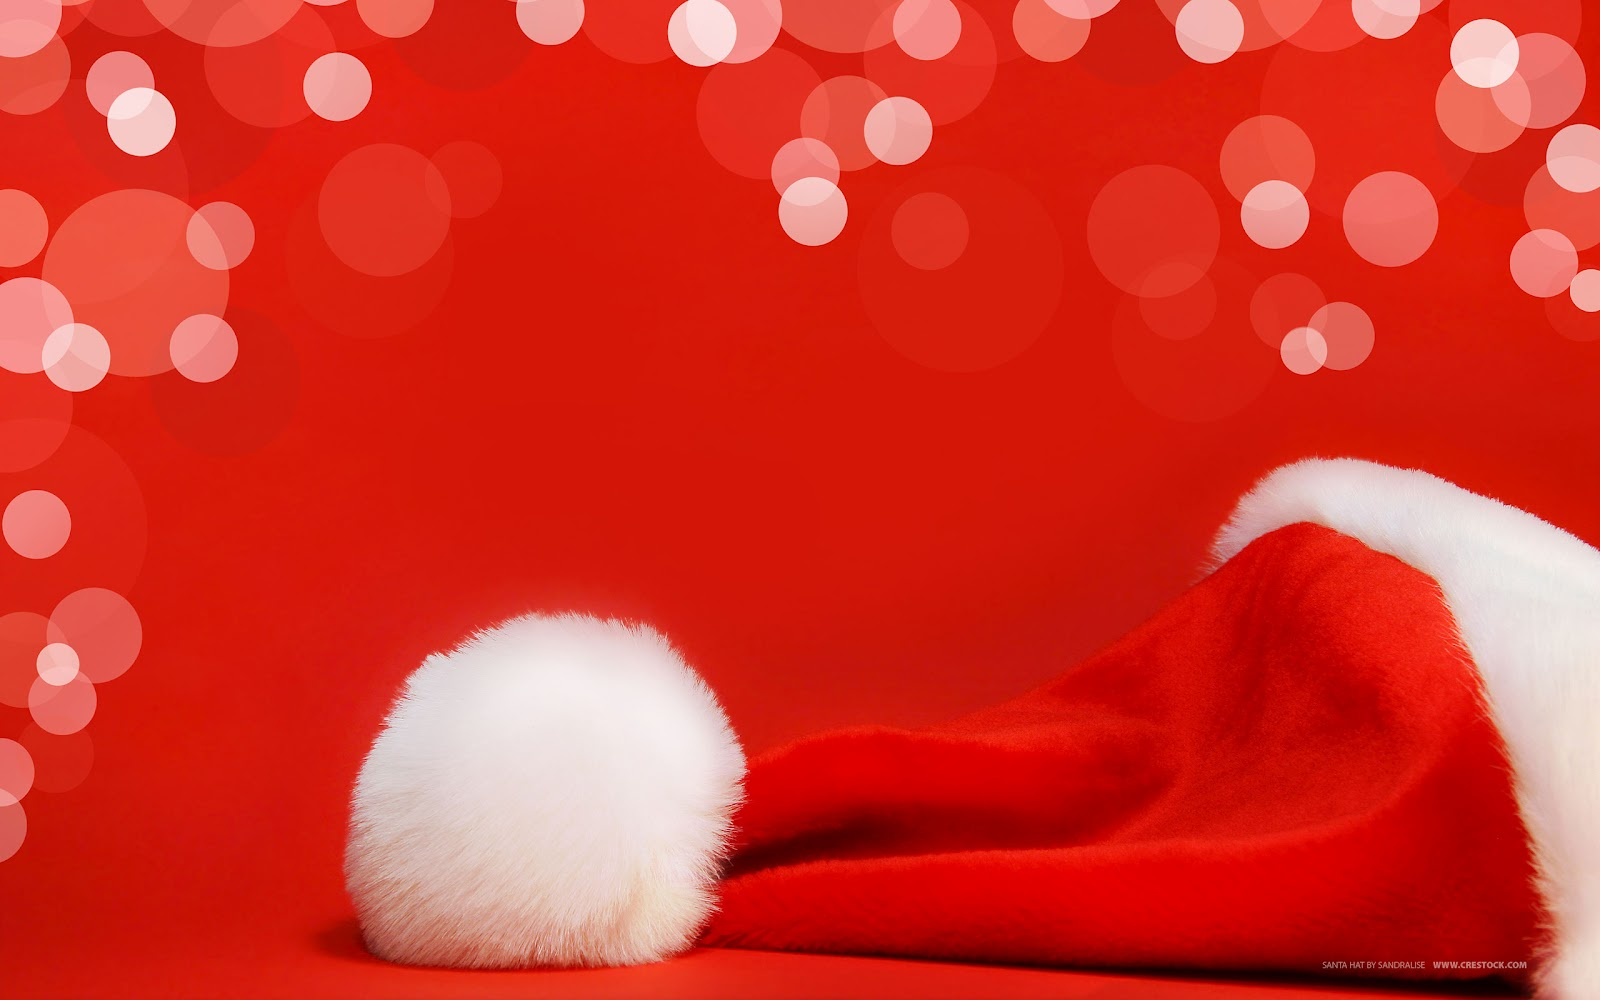 Background mũ giáng sinh